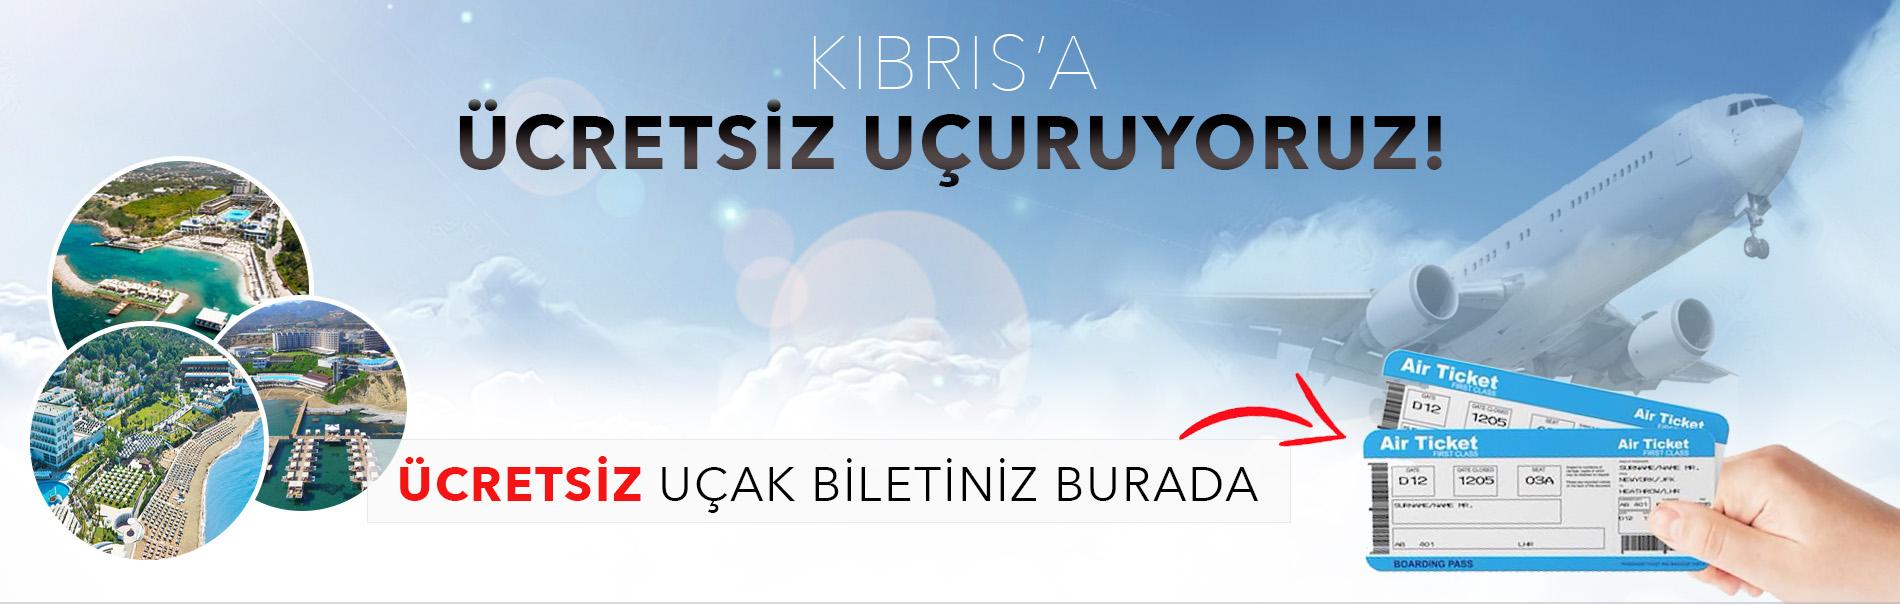 ucretsiz-kibris-17042019155943